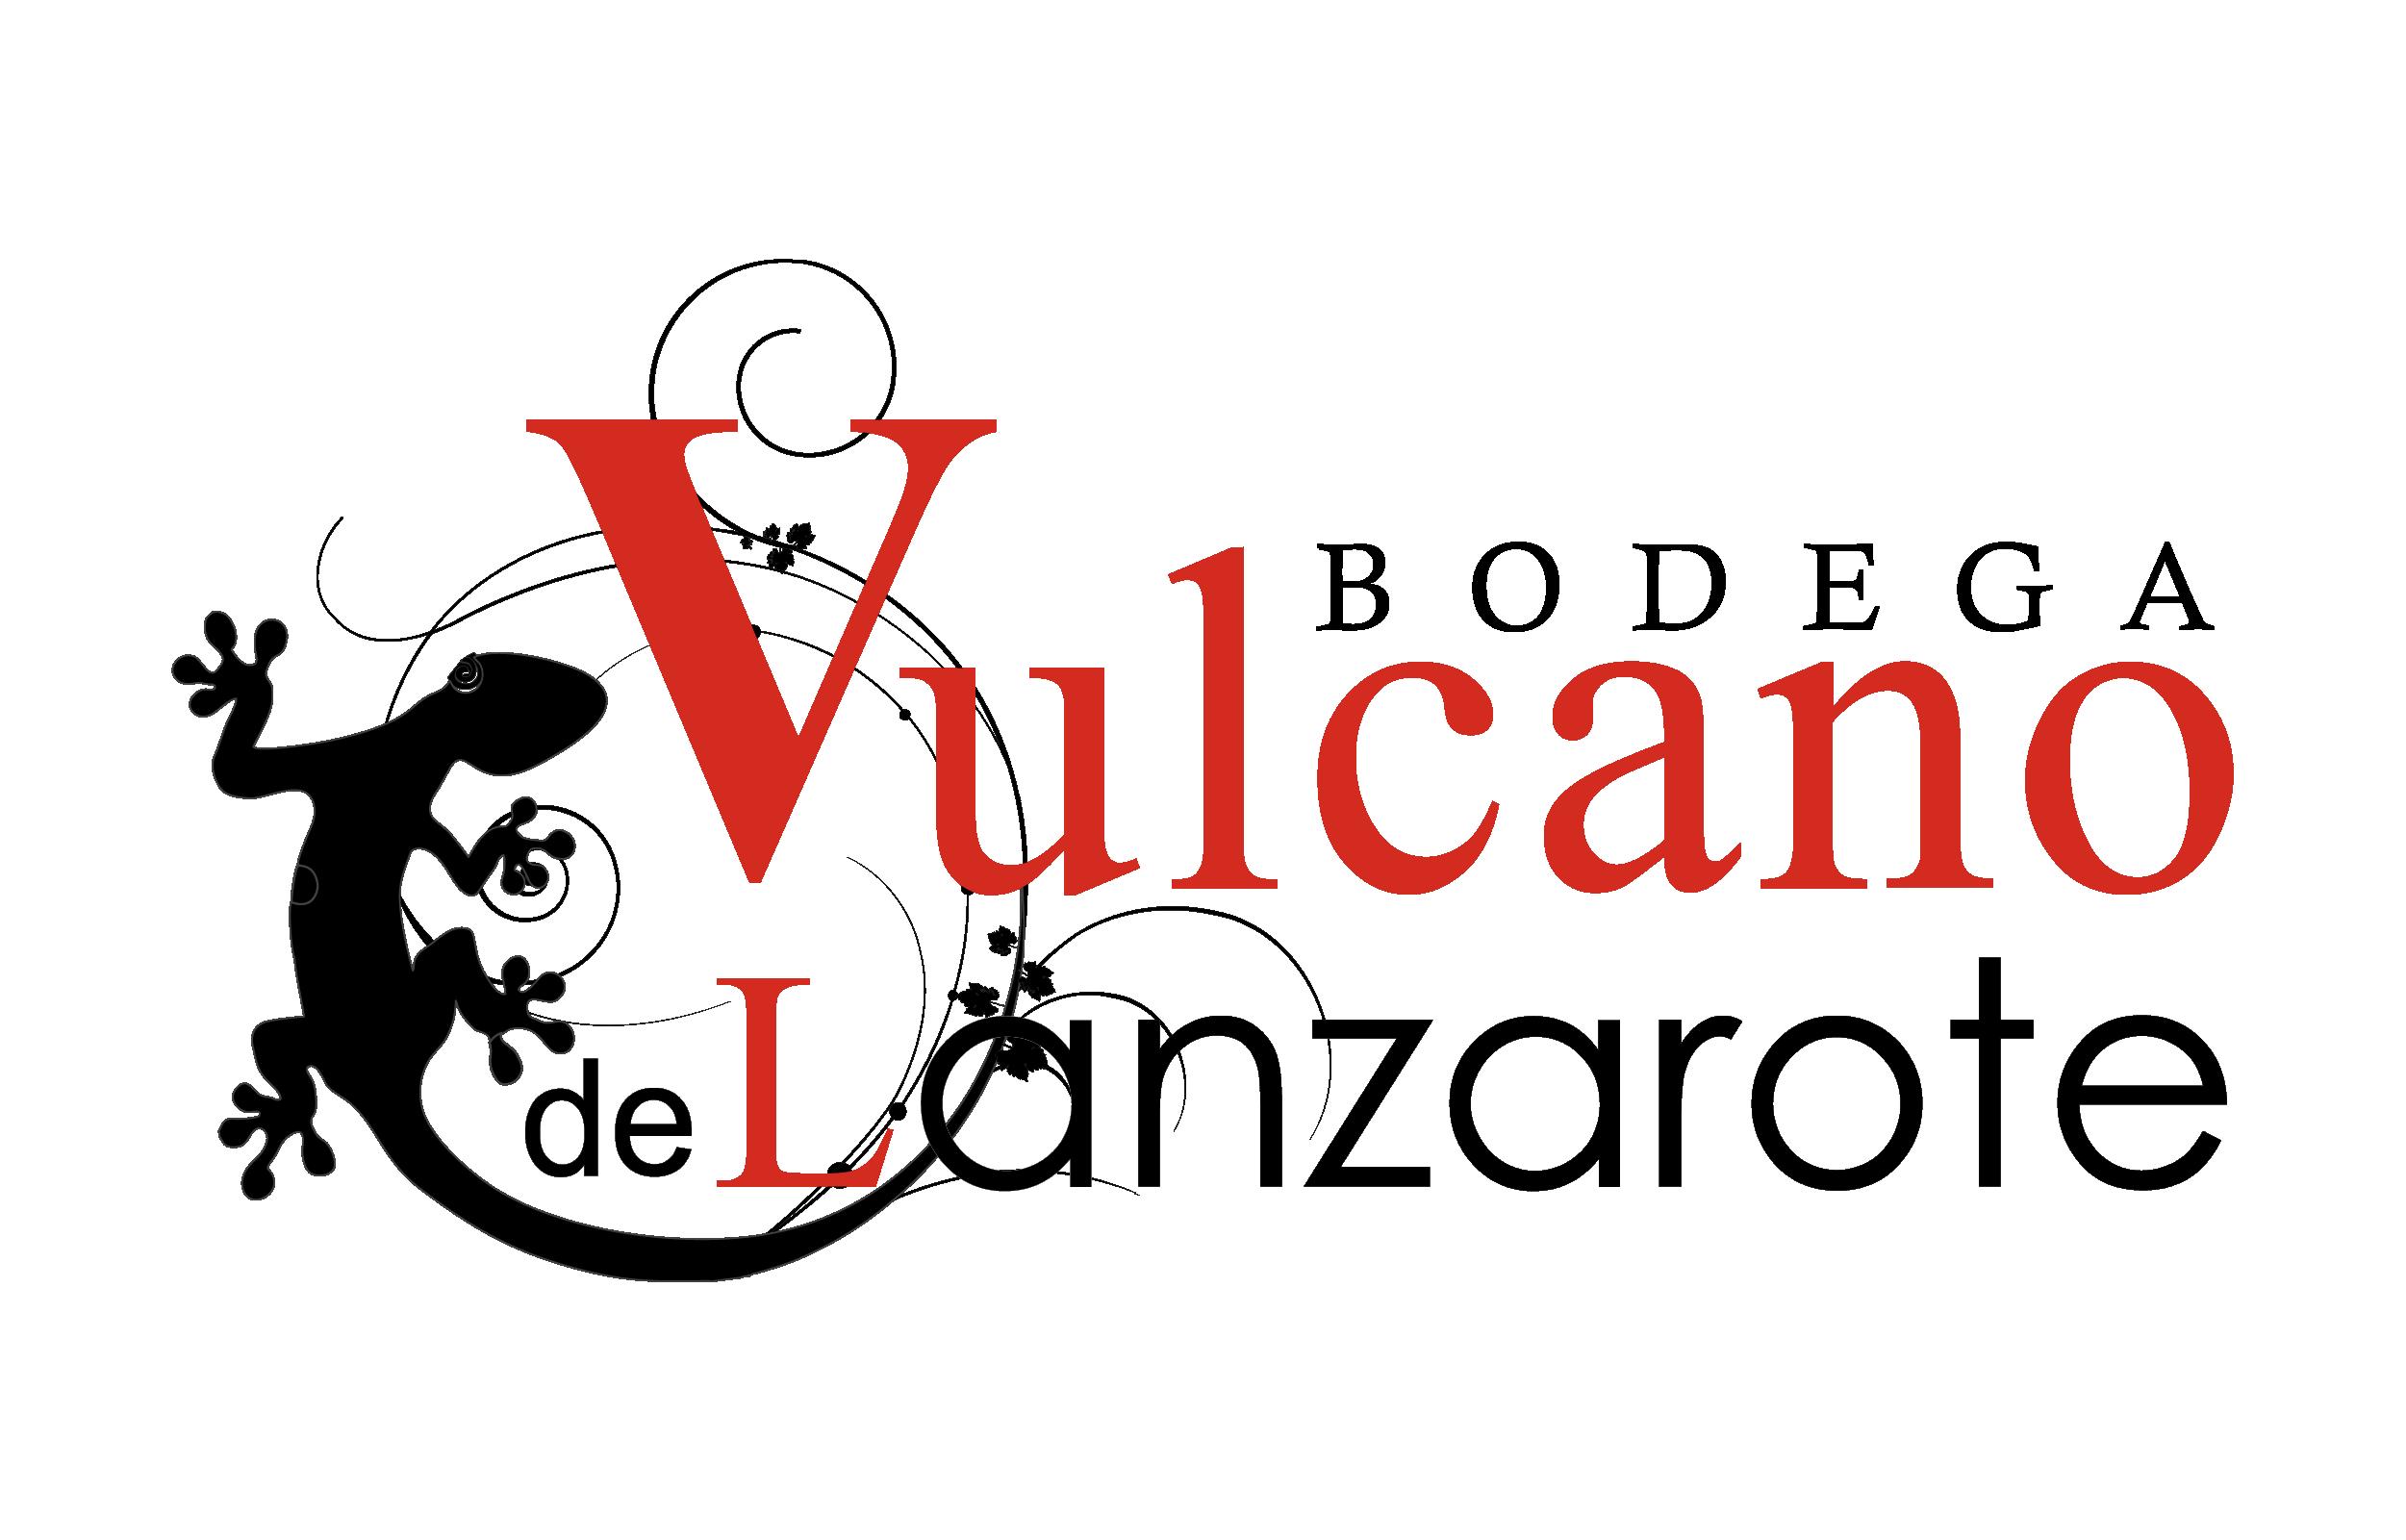 Bodega Vulcano